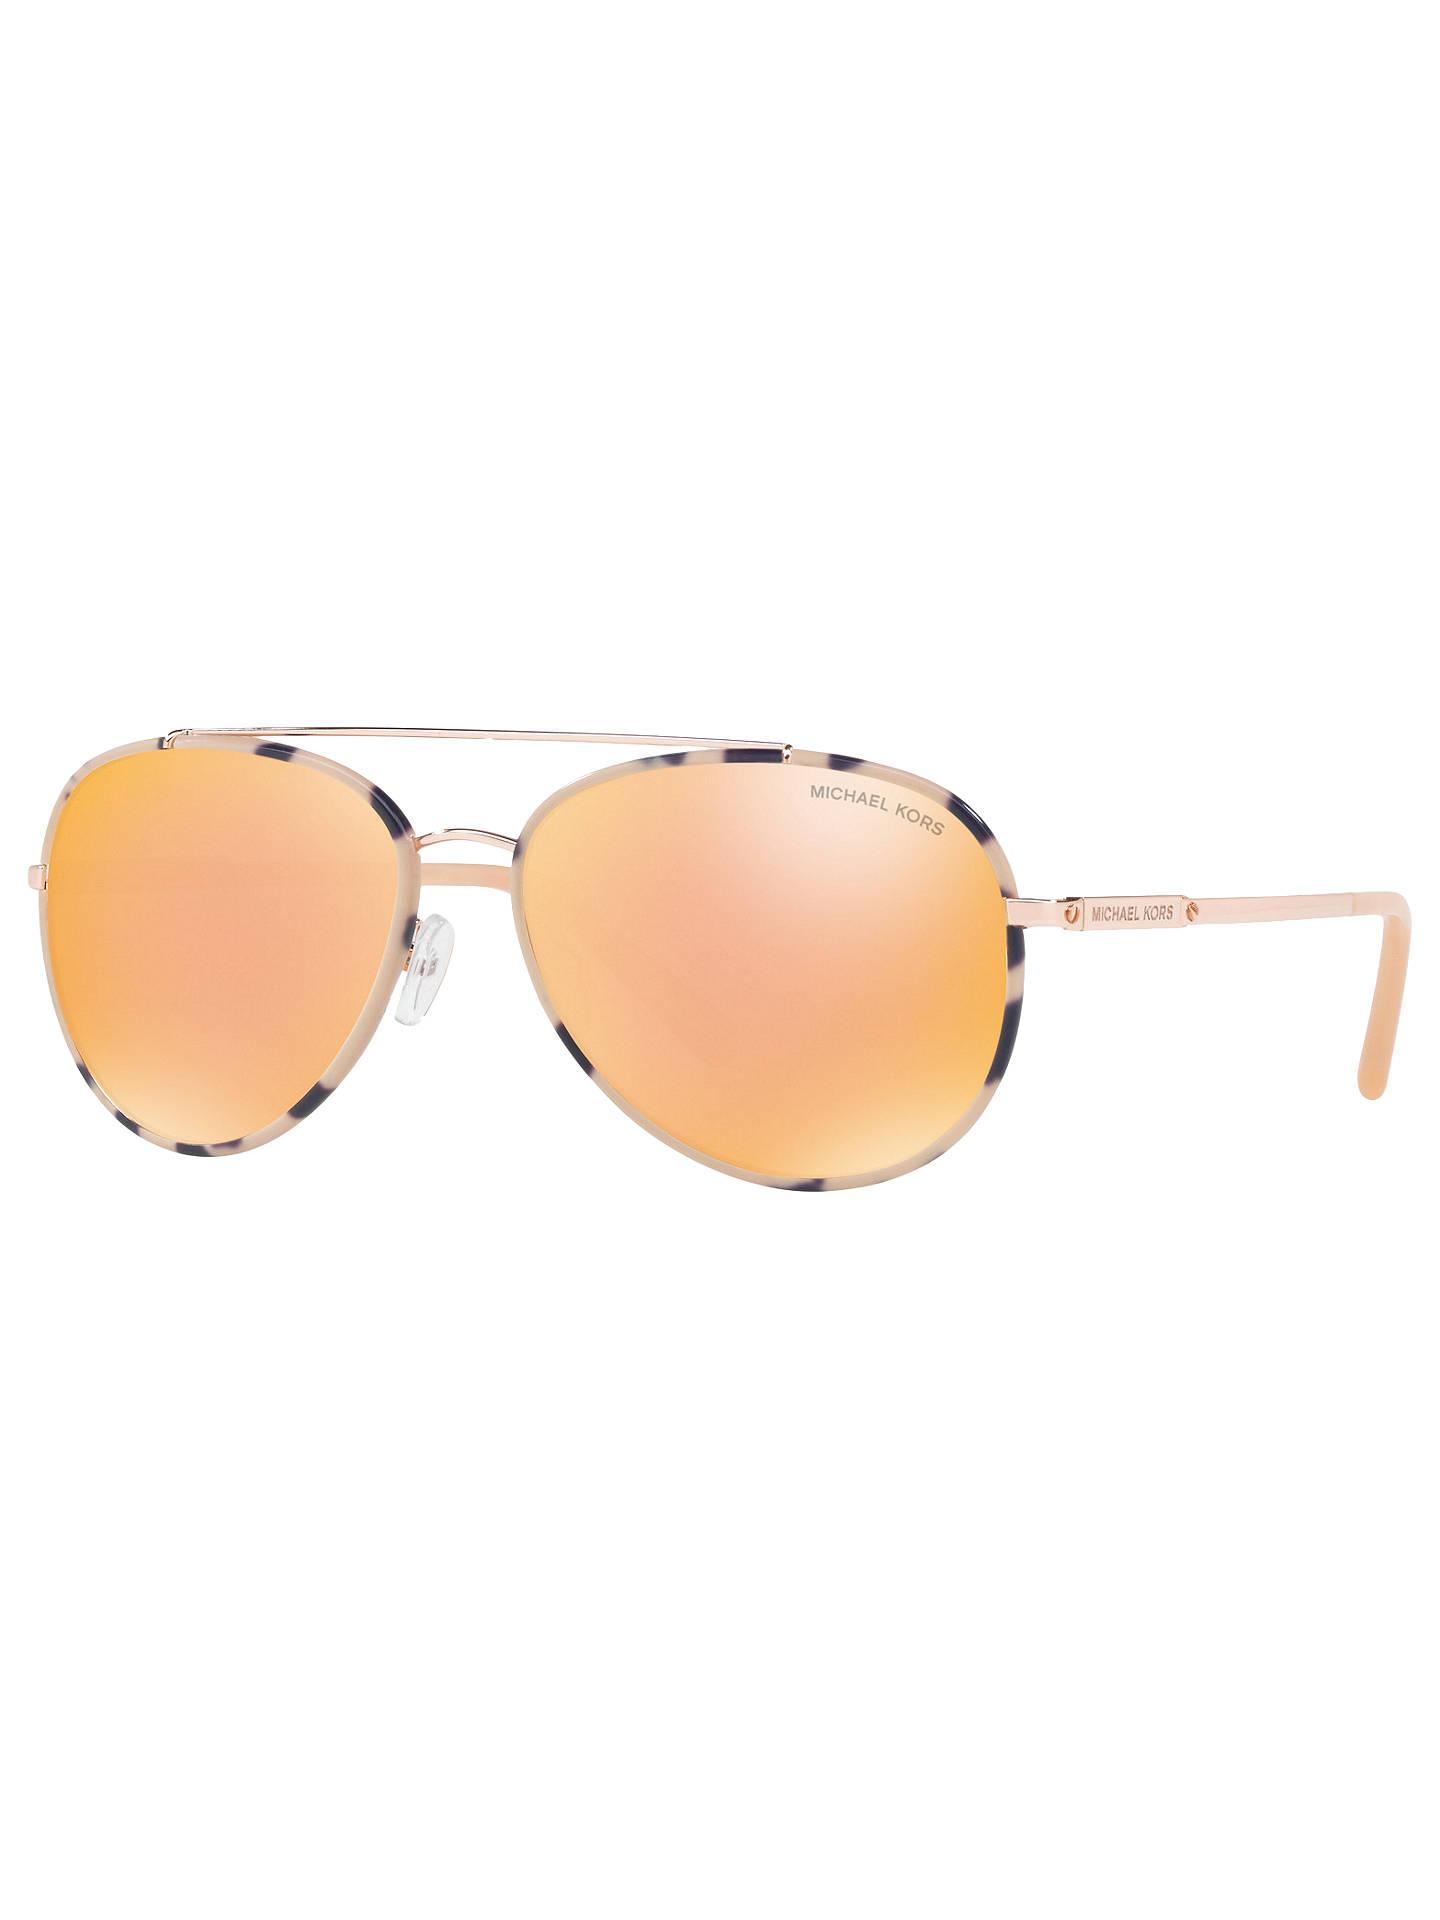 5ab8b0b02bce Buy Michael Kors MK1019 Ida Aviator Sunglasses, Rose Gold/Mirror Orange  Online at johnlewis